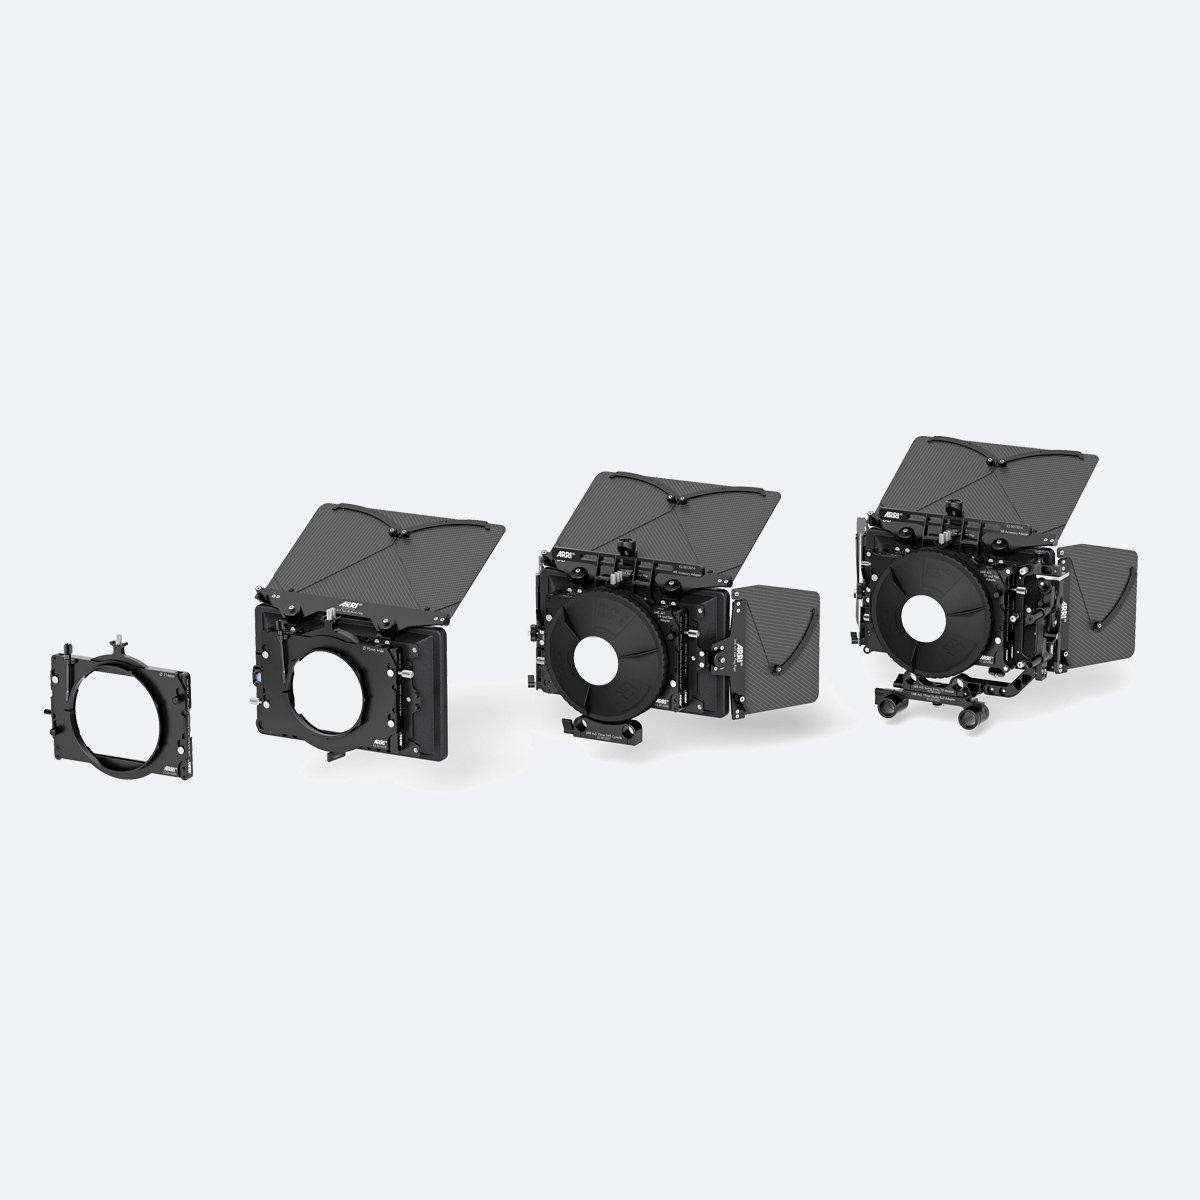 ARRI LMB 4x5 Lightweight Matte Box